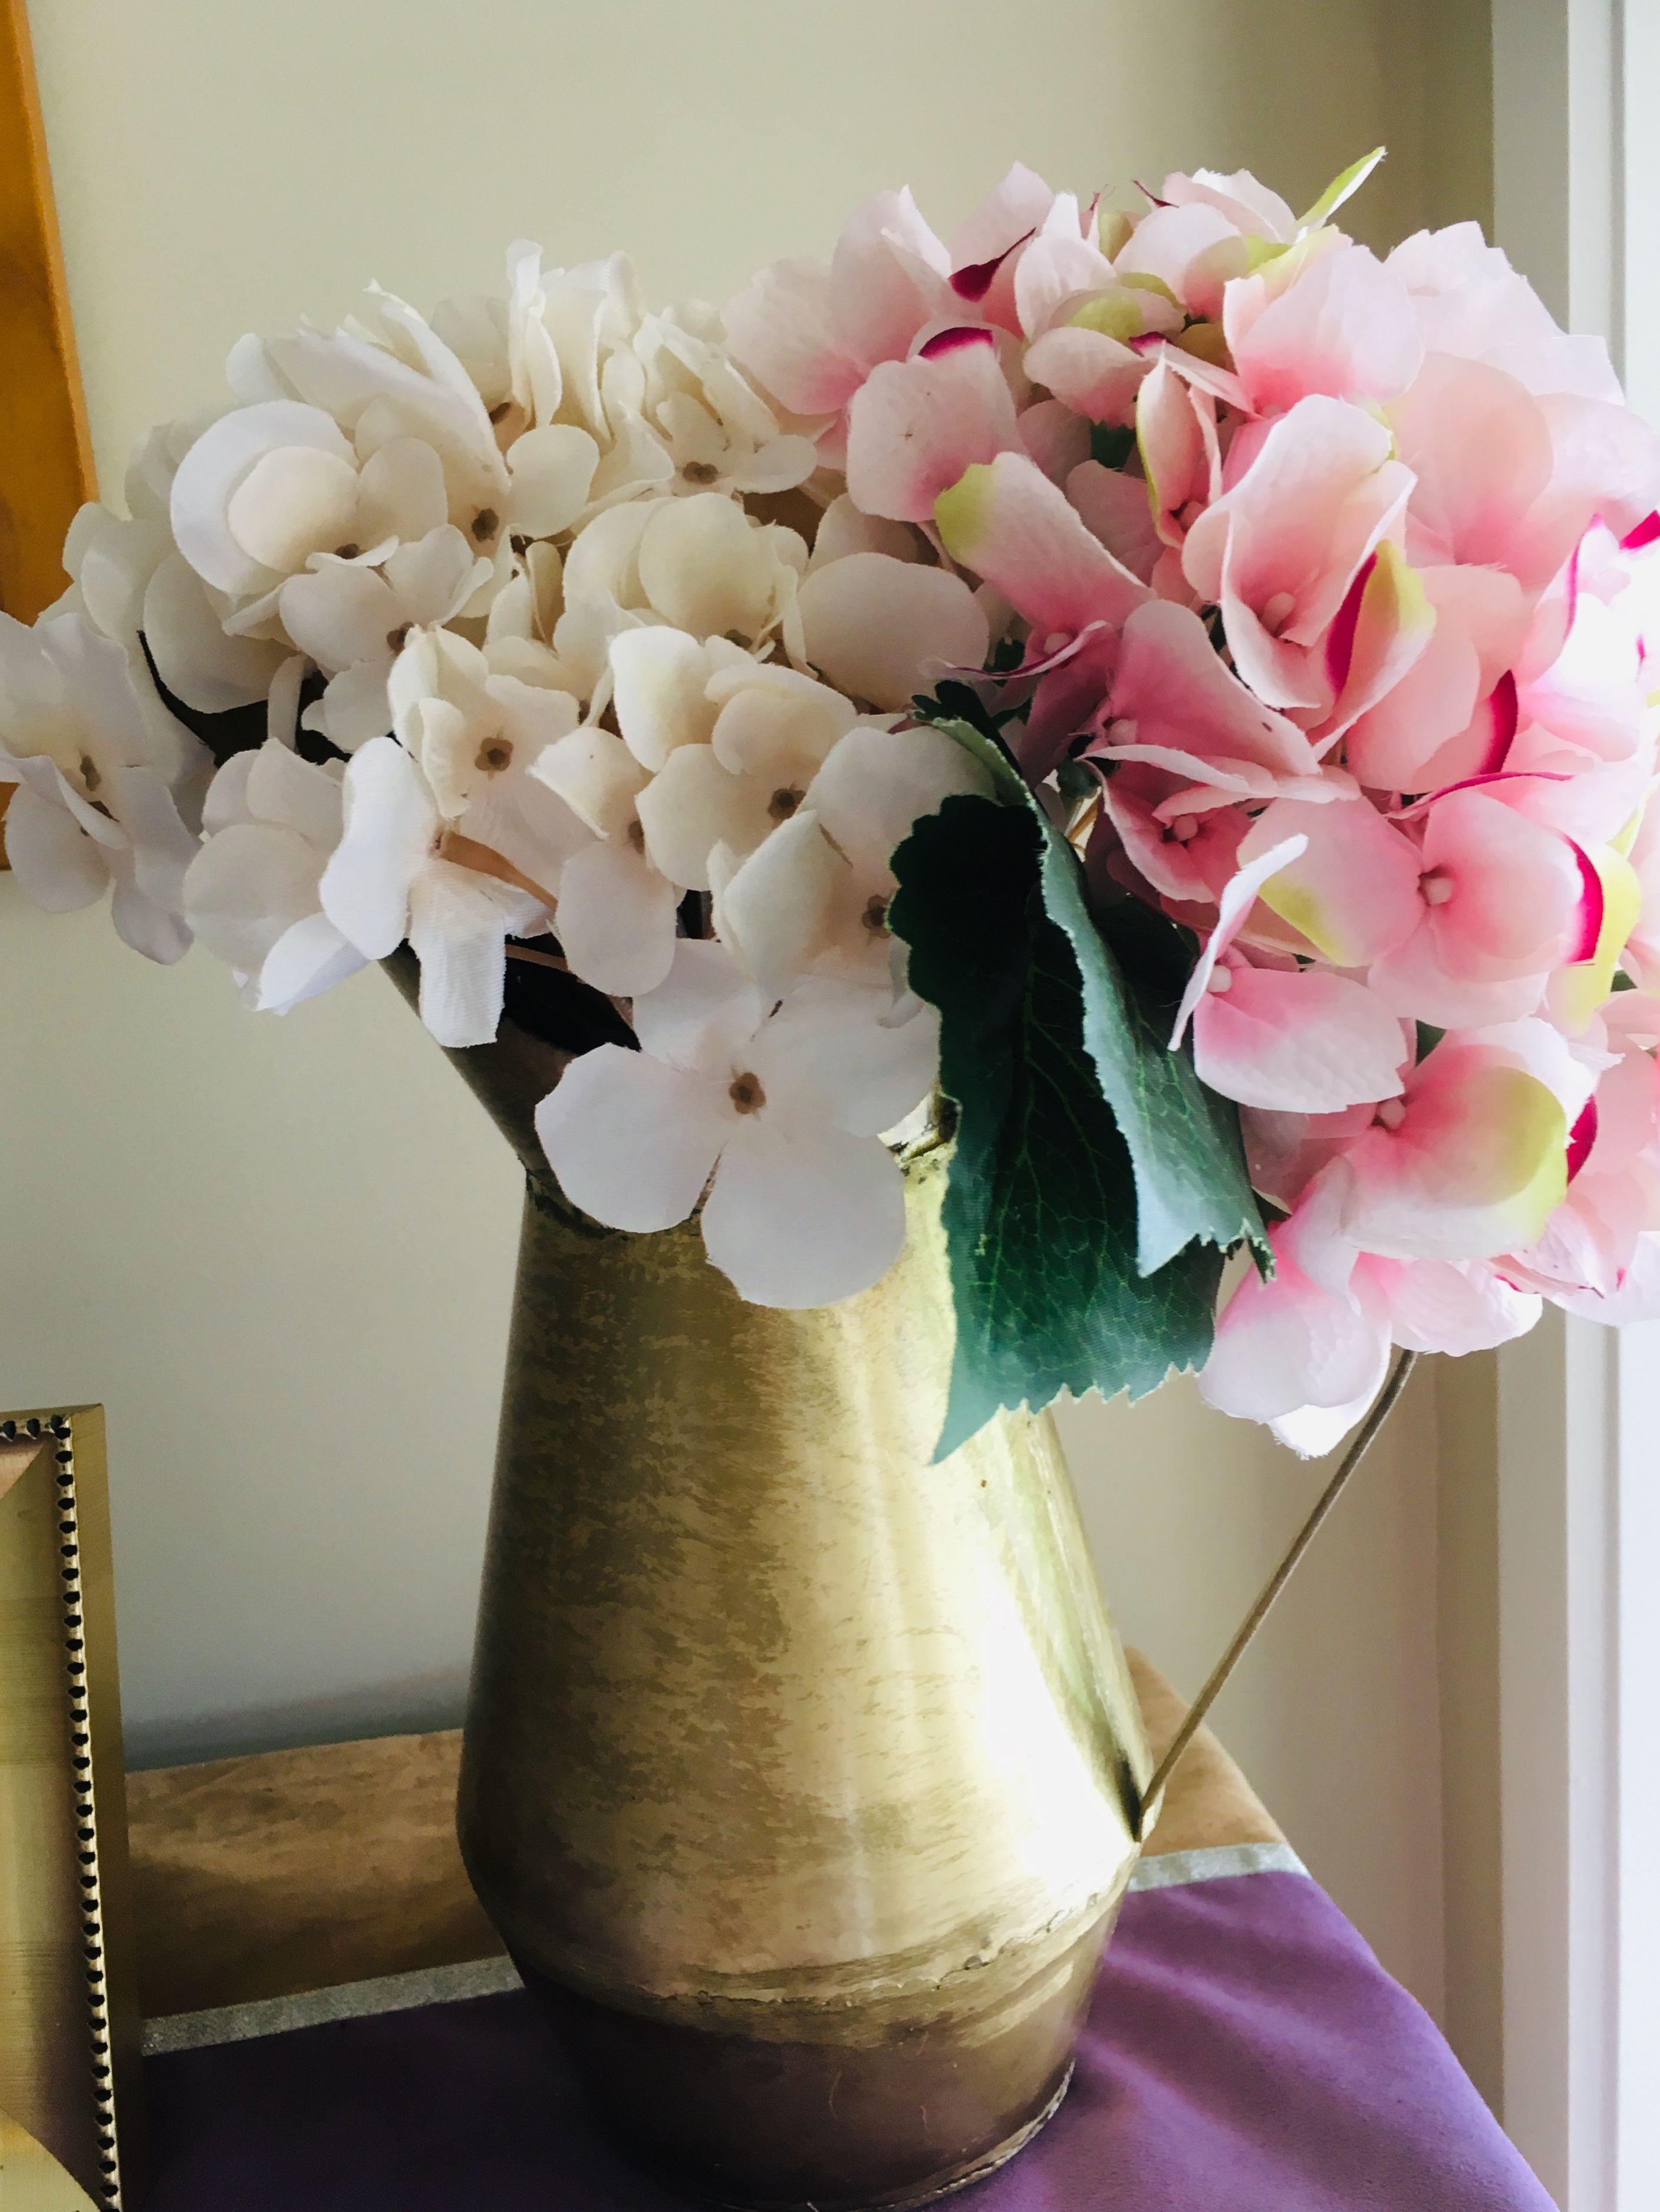 Brass India Pitcher With Hydrangeas Flower Arrangement With Images Hydrangea Flower Arrangements Flower Arrangements Diy Flowers